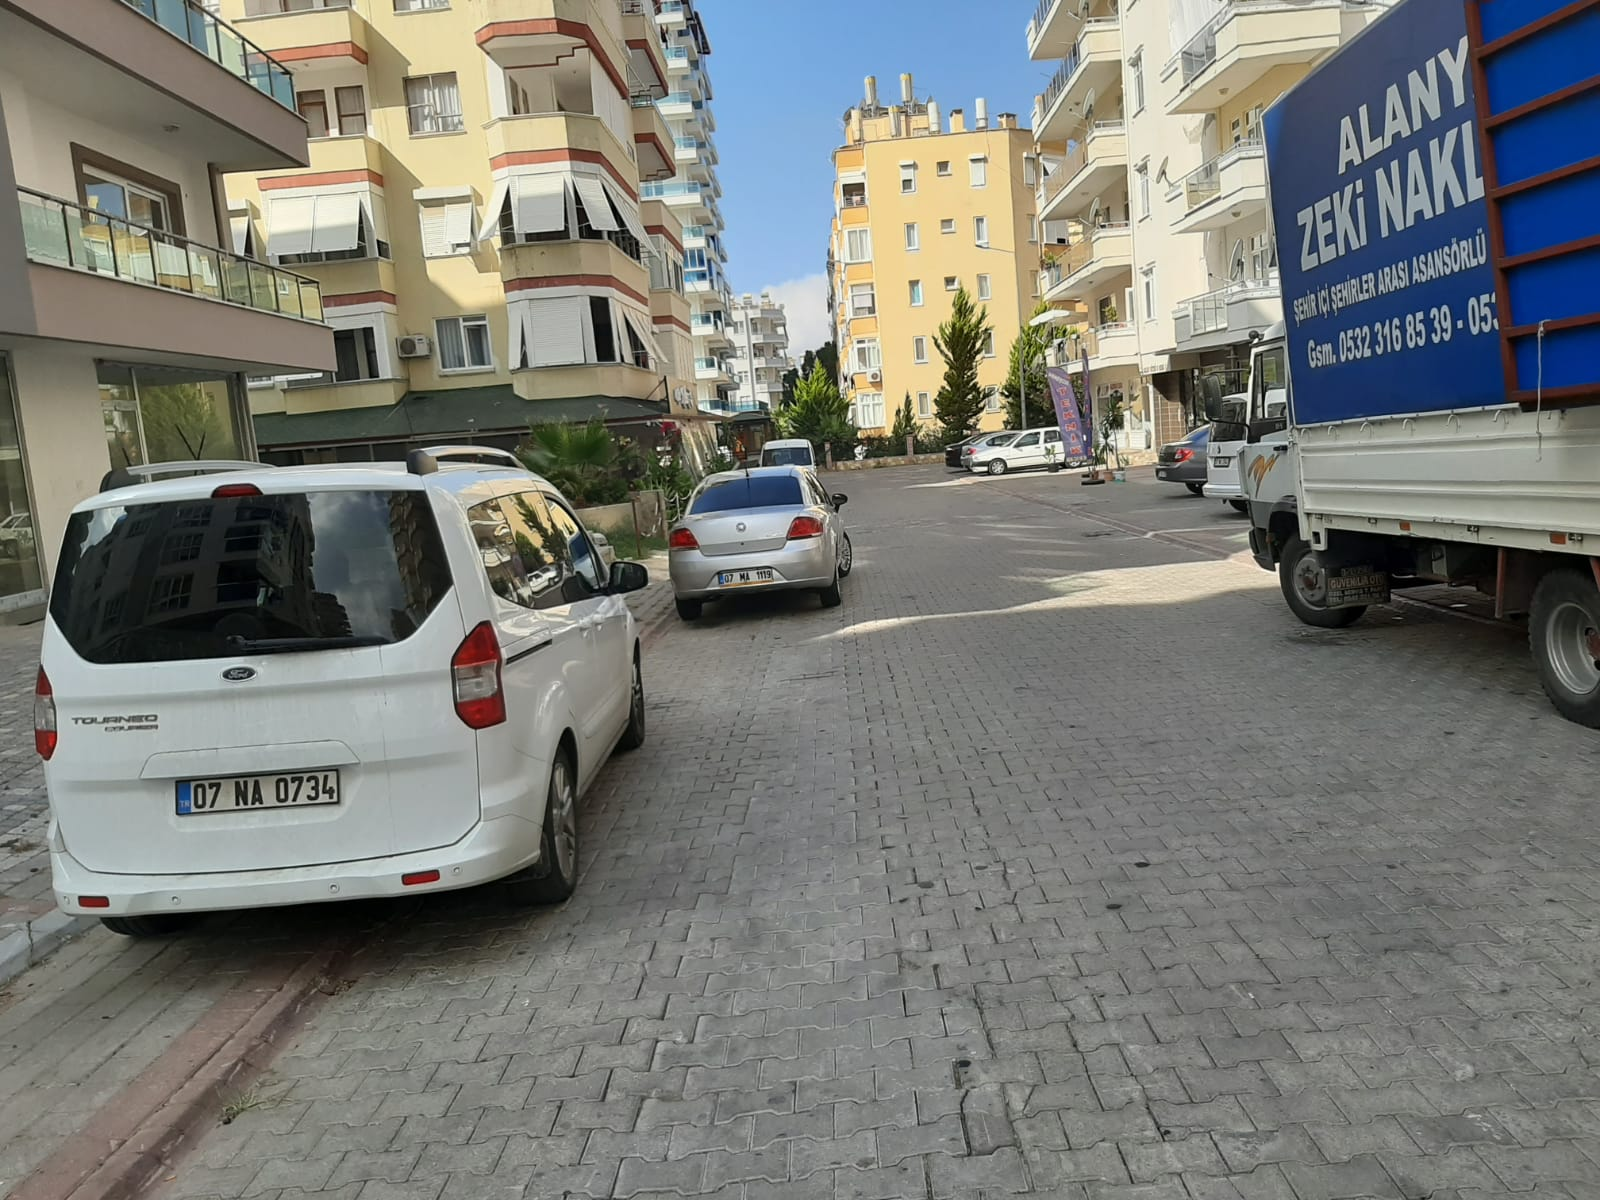 Алания Махмутлар продажа квартиры 1+1 с мебелью